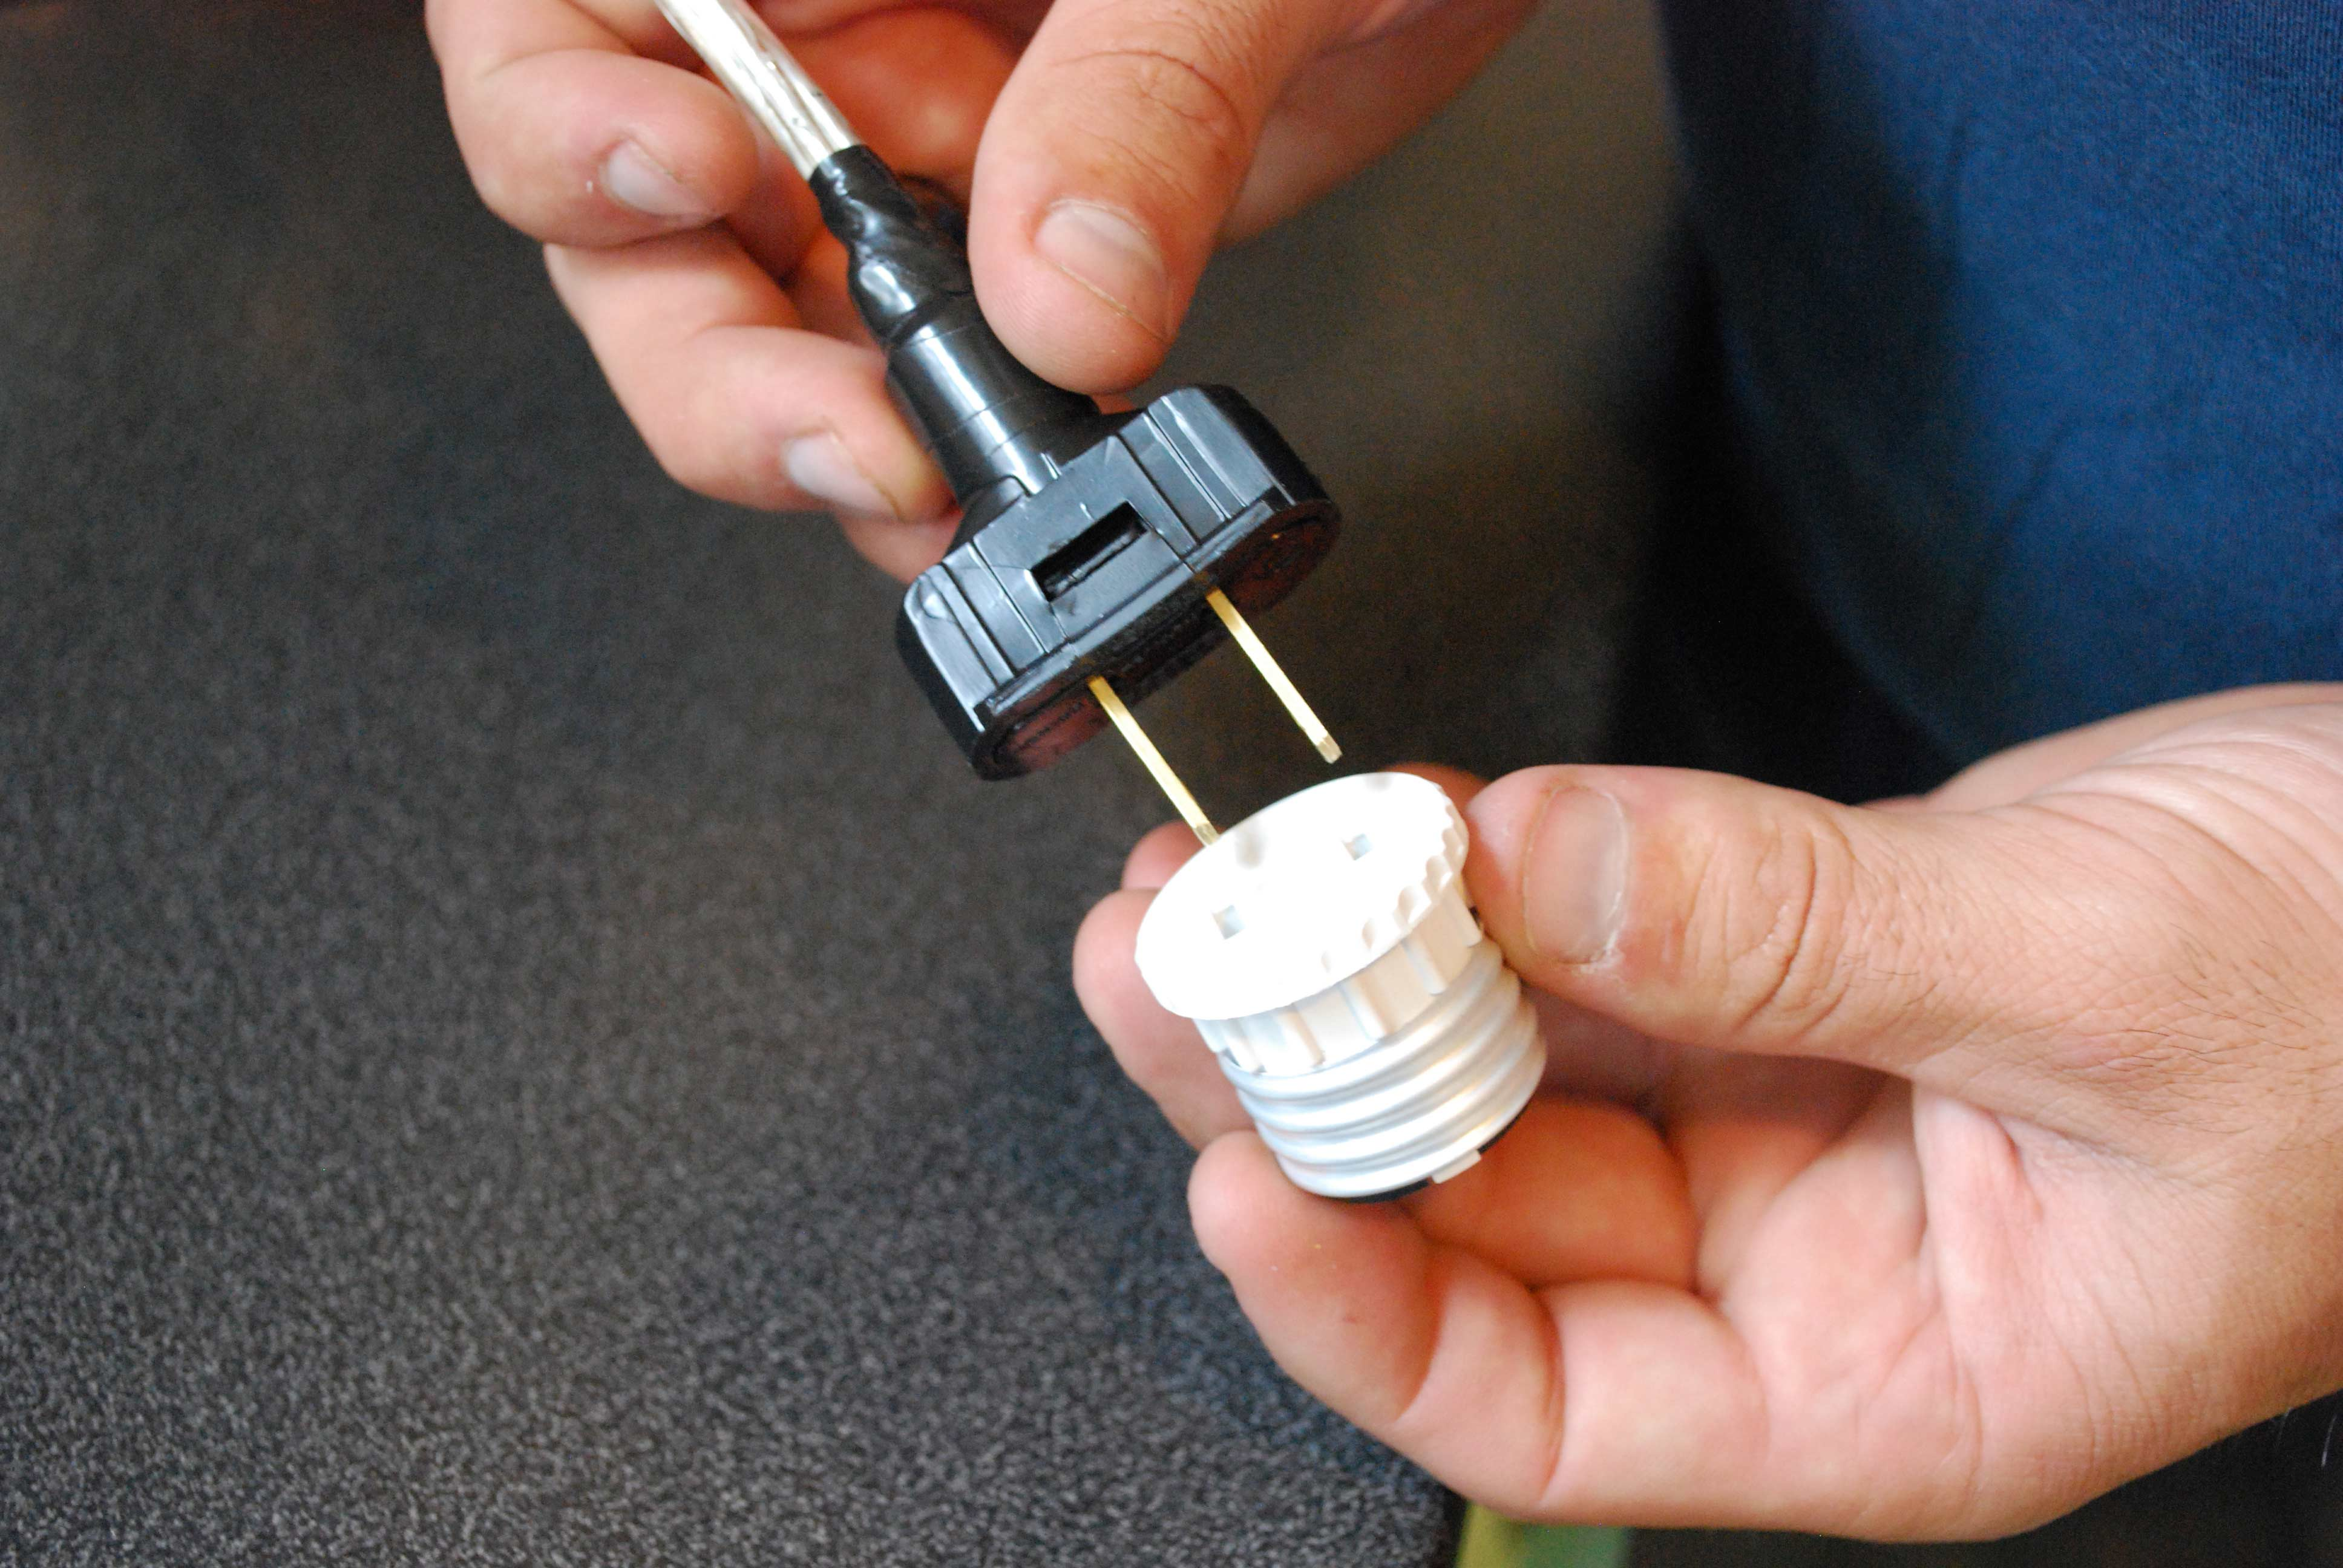 pendant lights that screw into socket installations